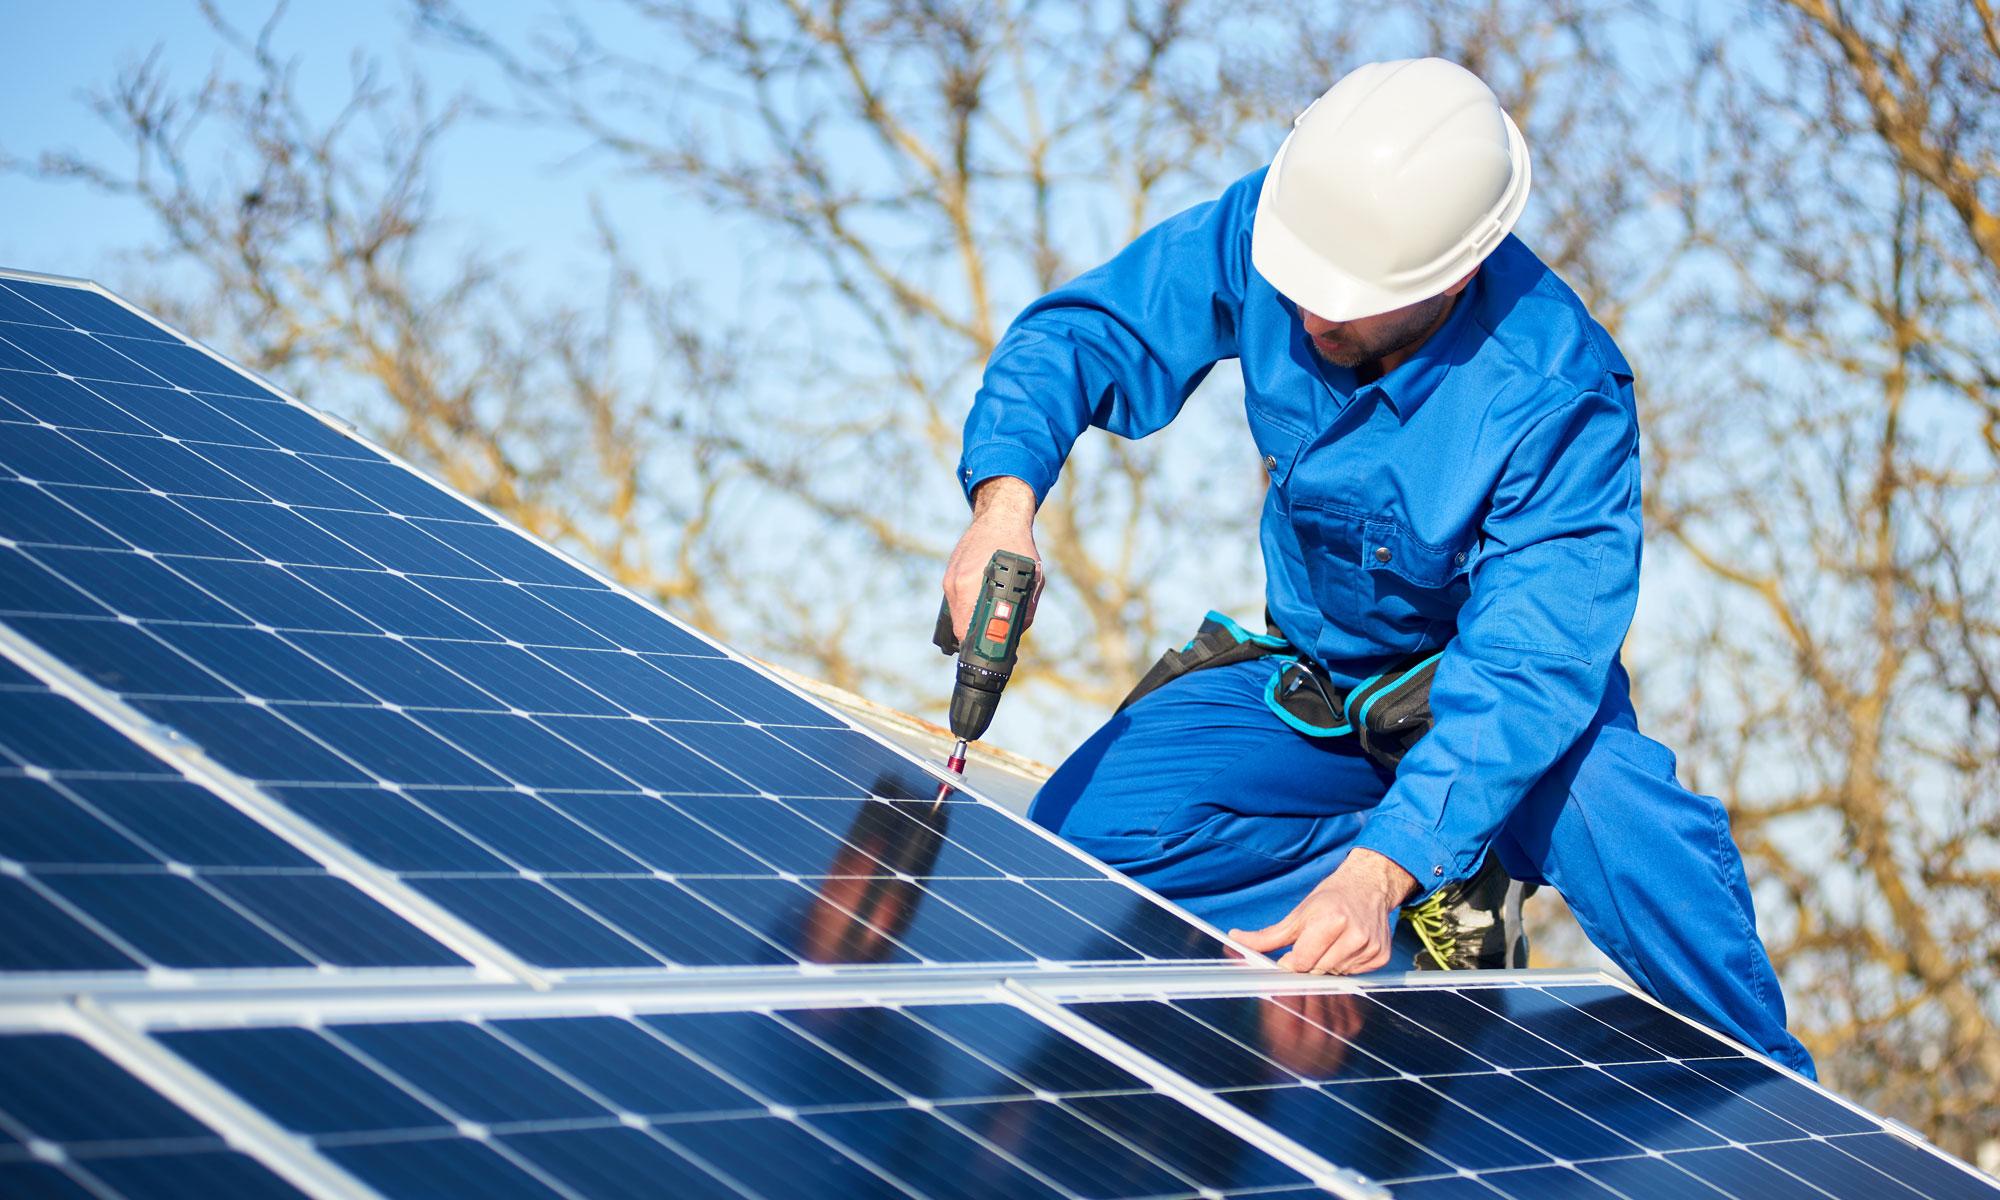 Energy regulators must protect solar jobs in Georgia